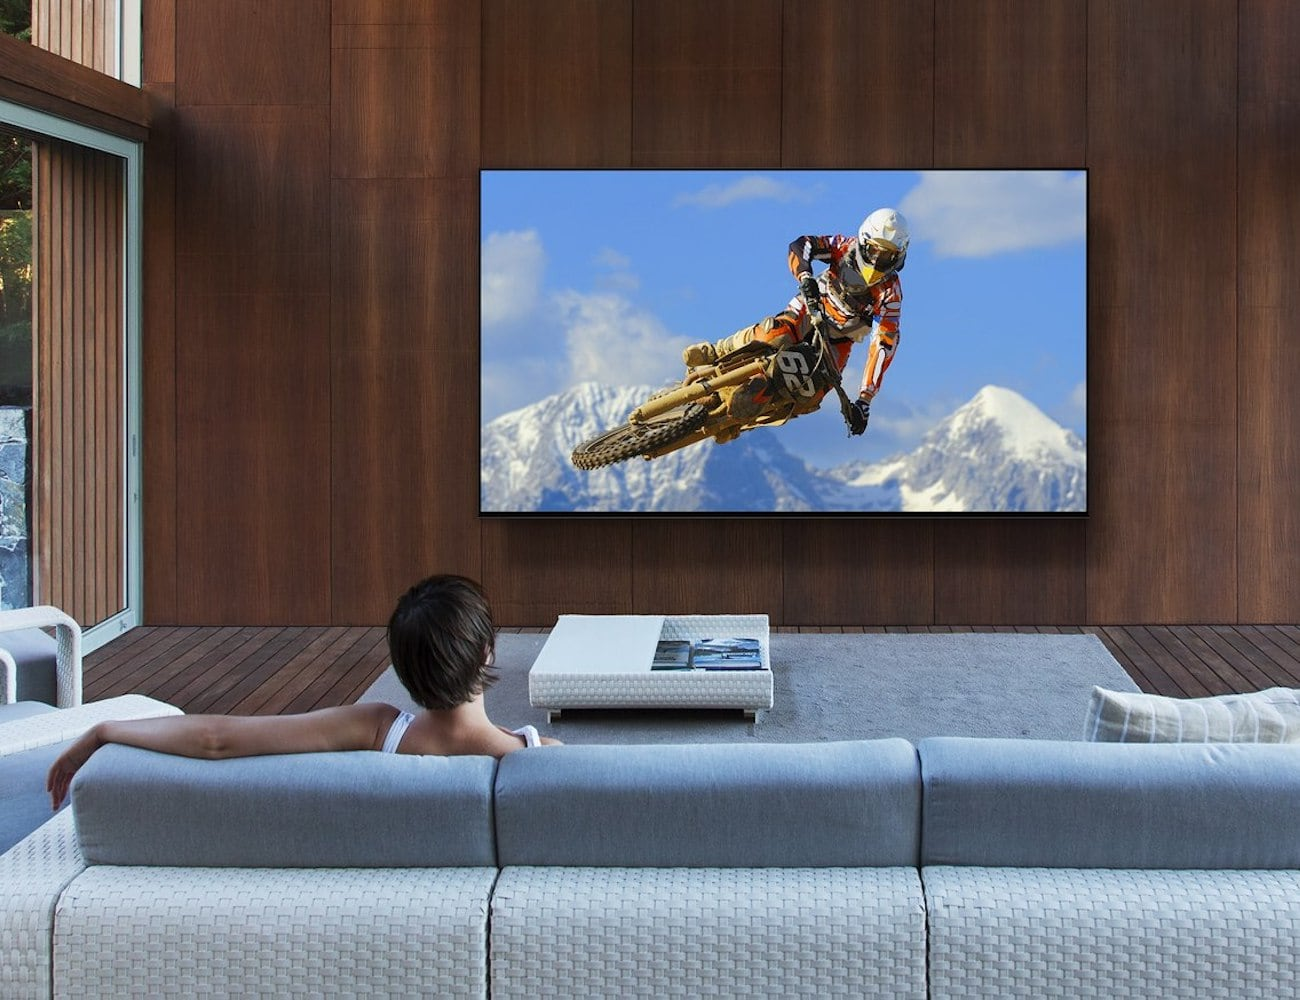 Sony Master Series Z9G 8K HDR TV